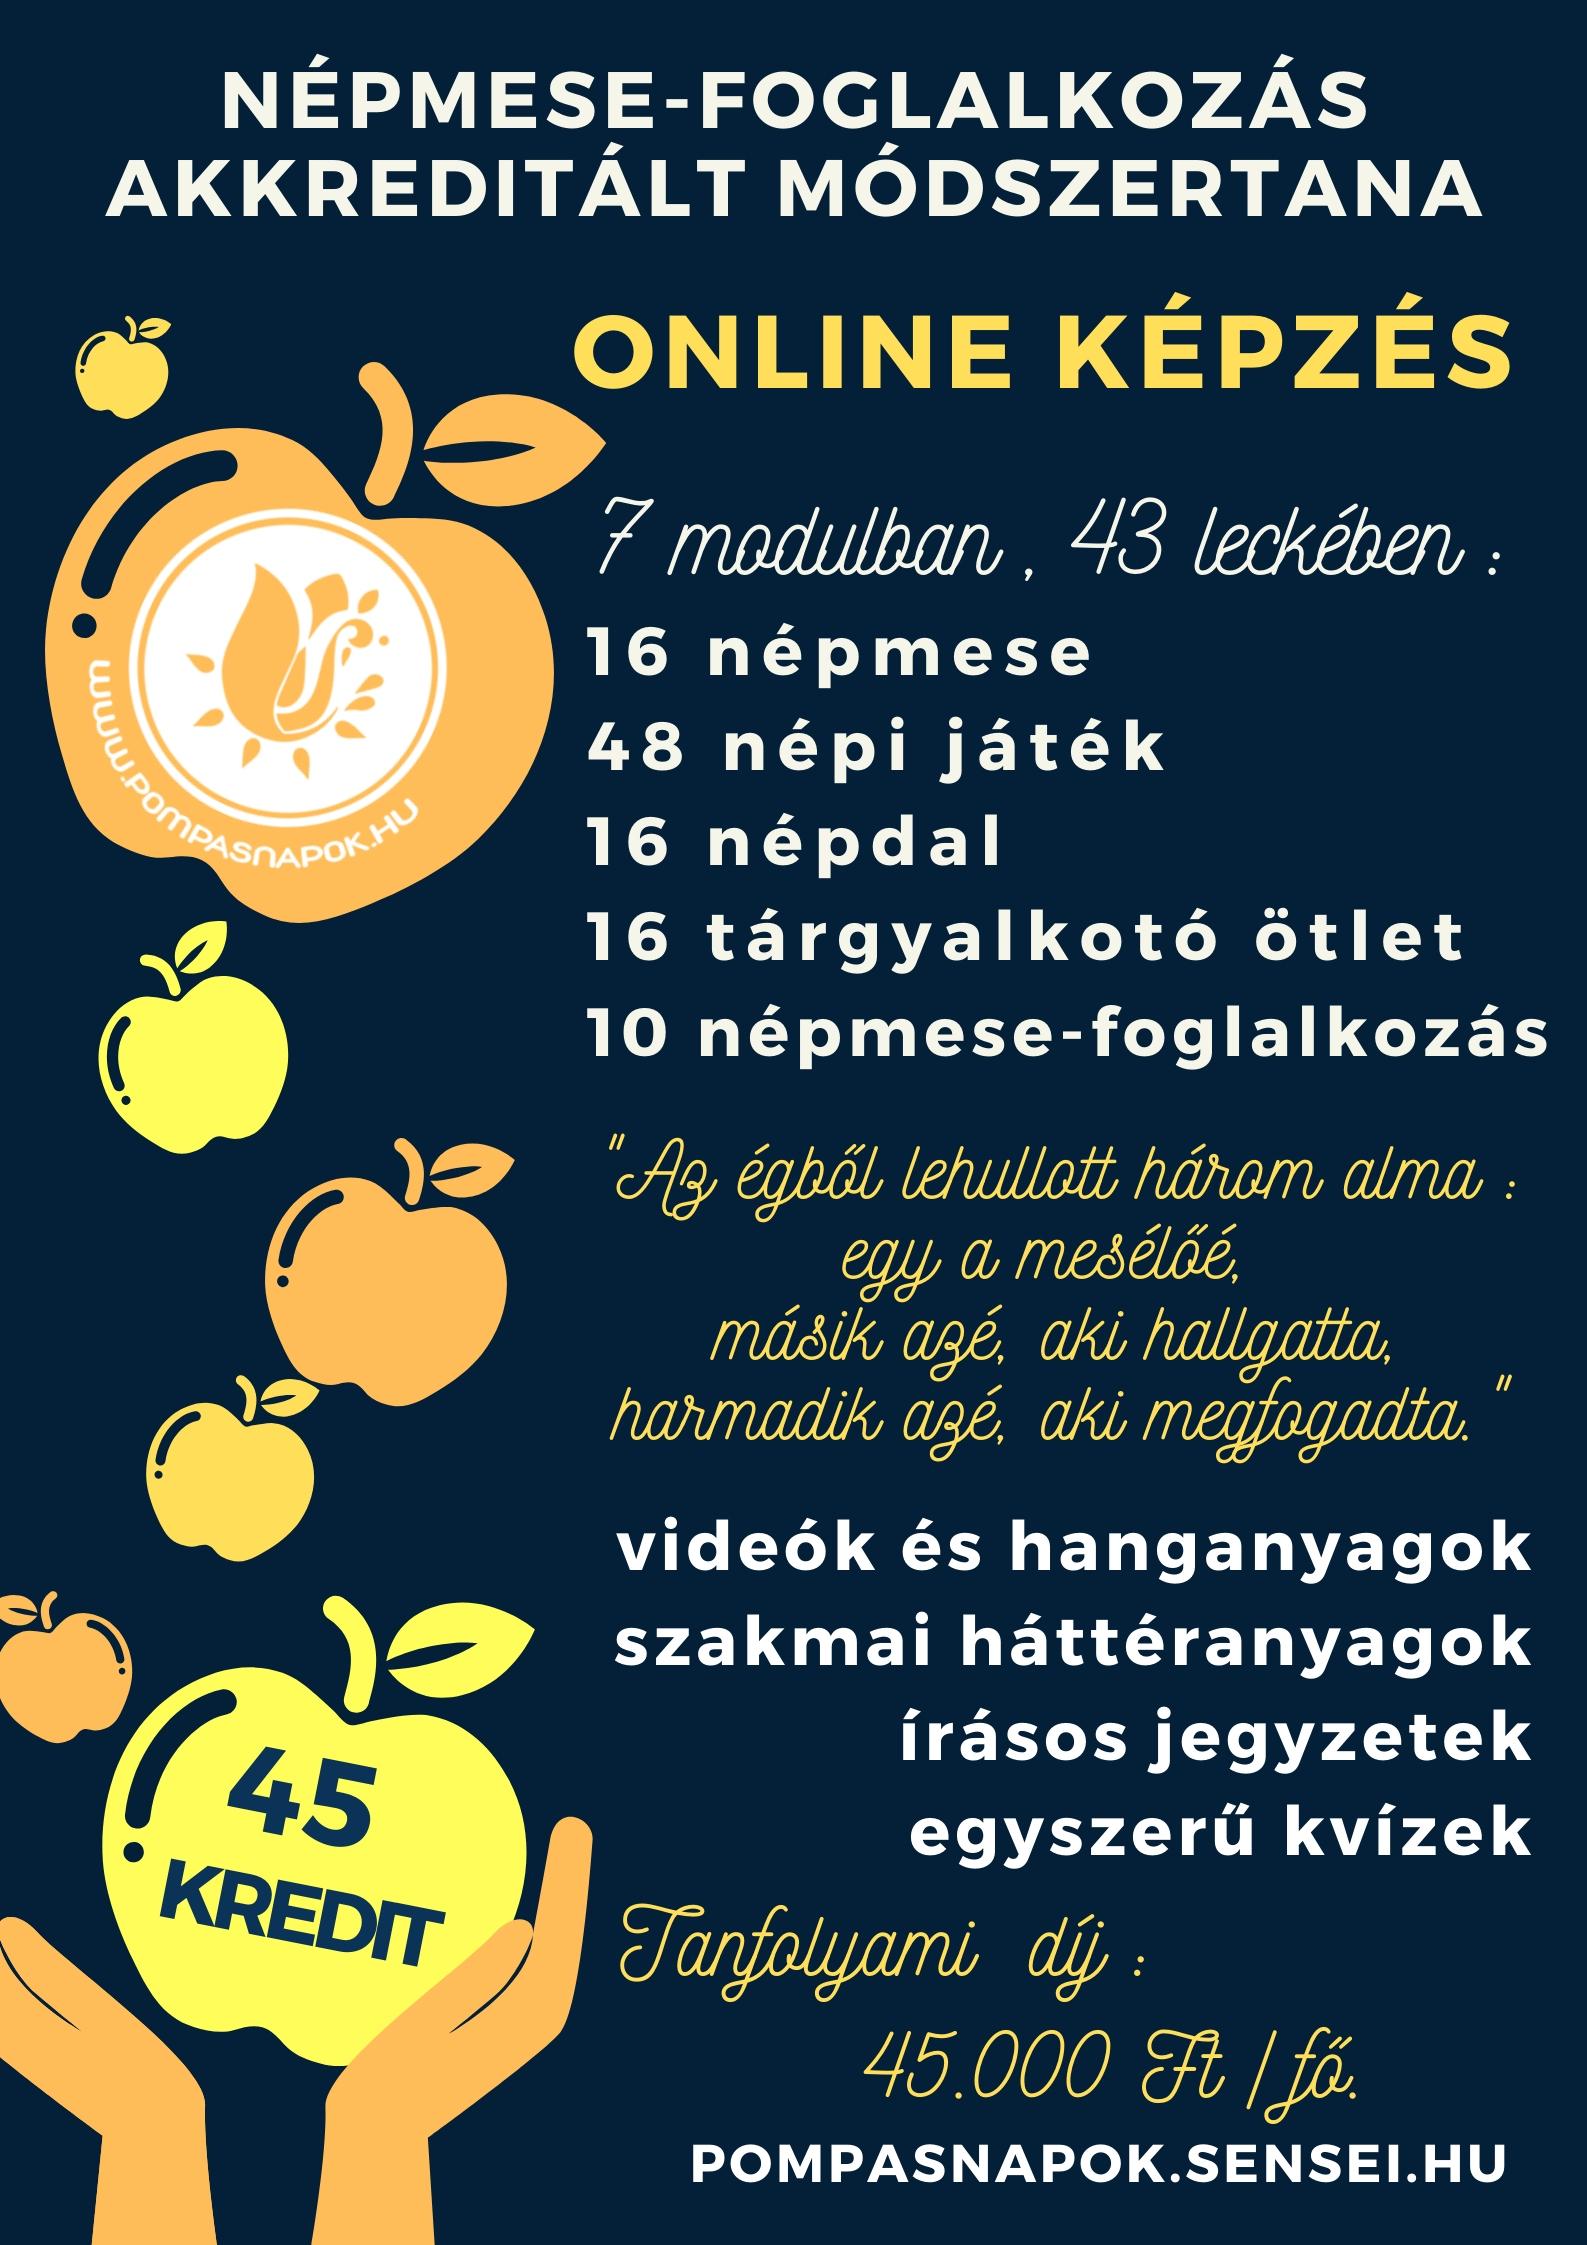 45_kredites_nepmese-foglalkozas_online_modszertani_tanf.jpg